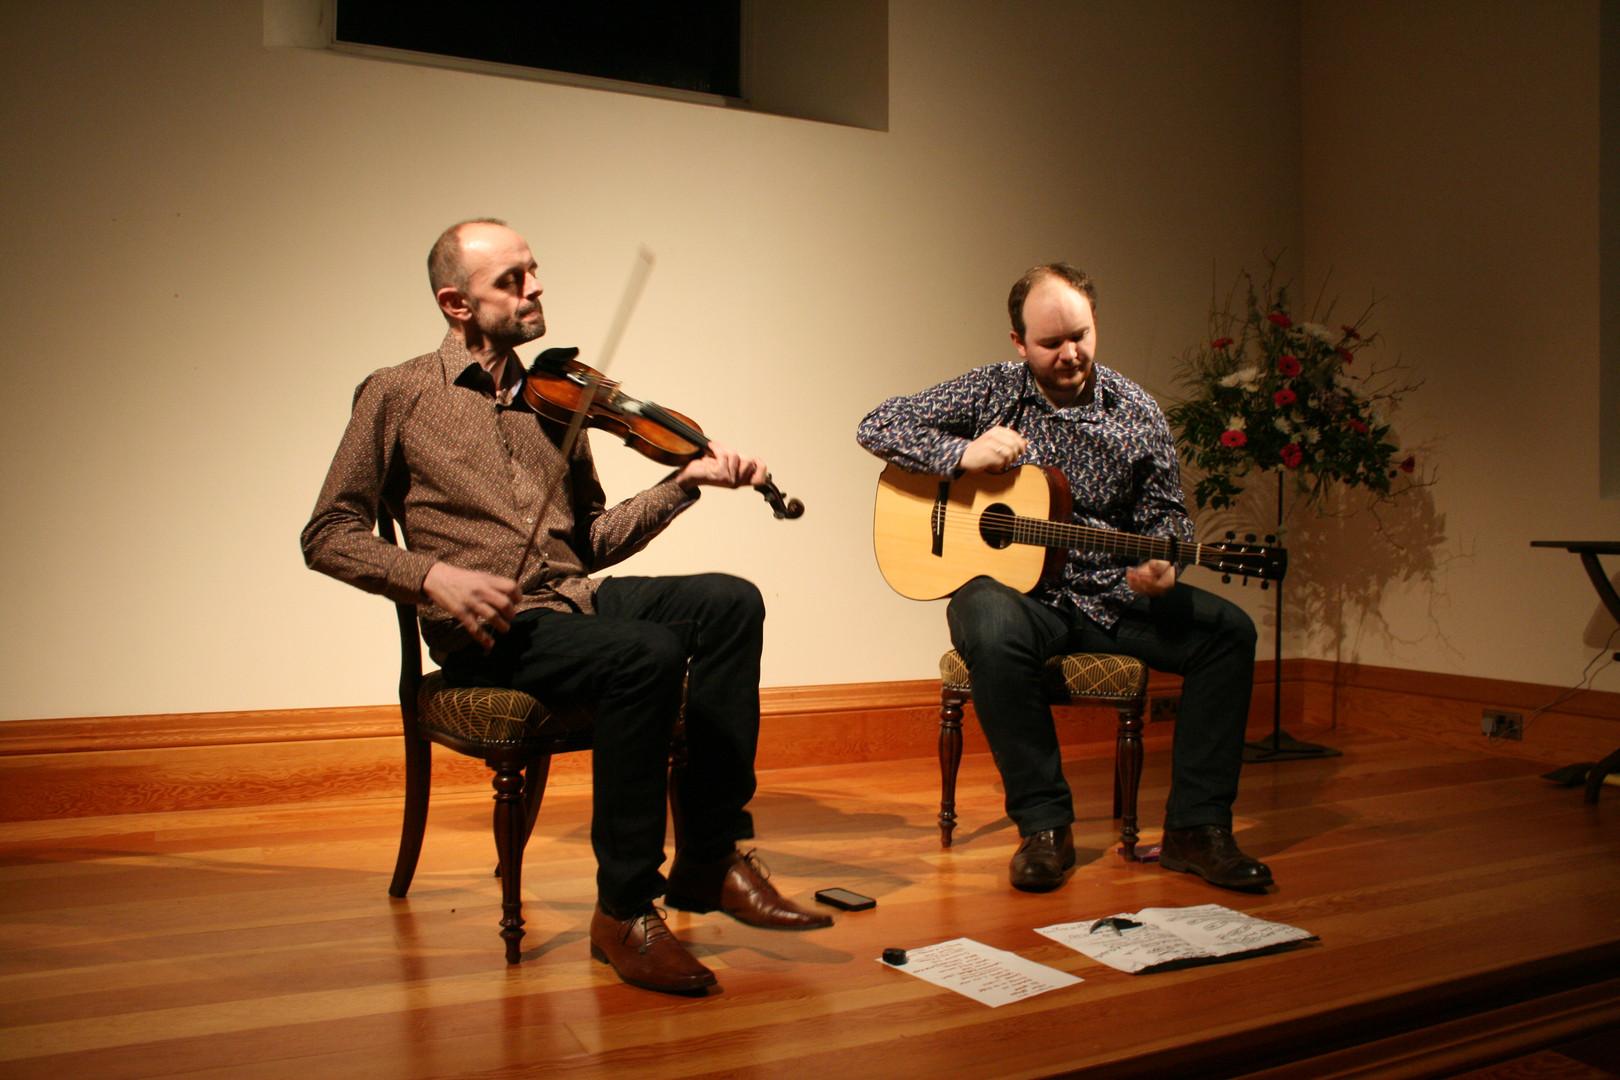 Duncan Chisholm and Matheu Watson